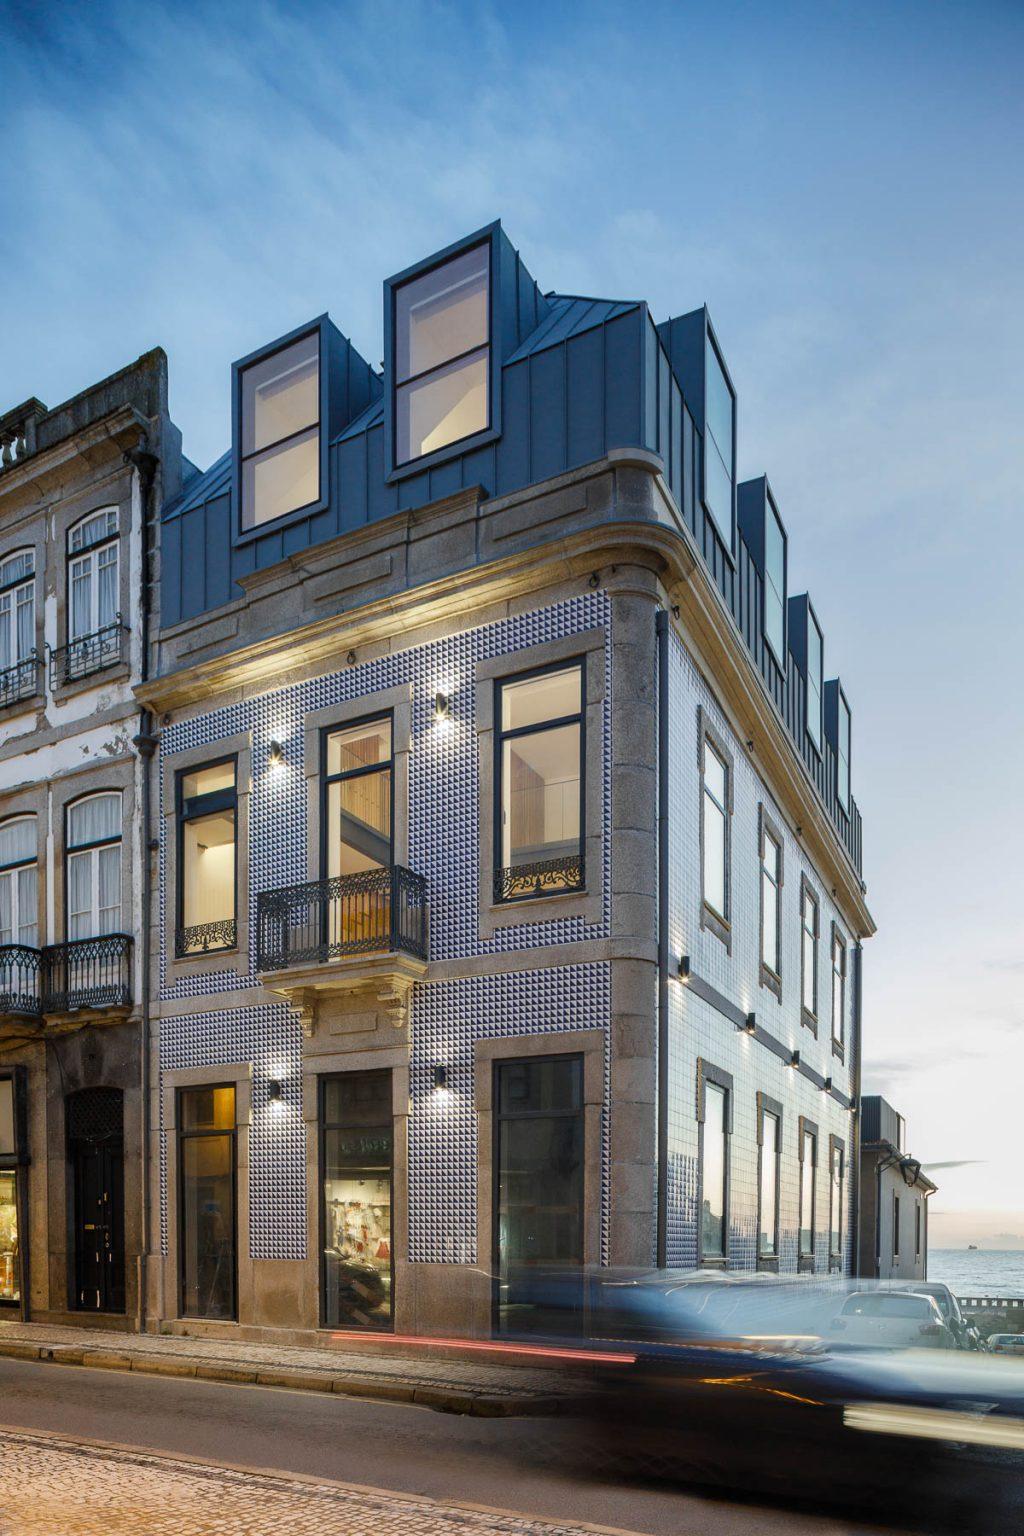 Renovation of Prédio Foz in Porto - As Arquitecto